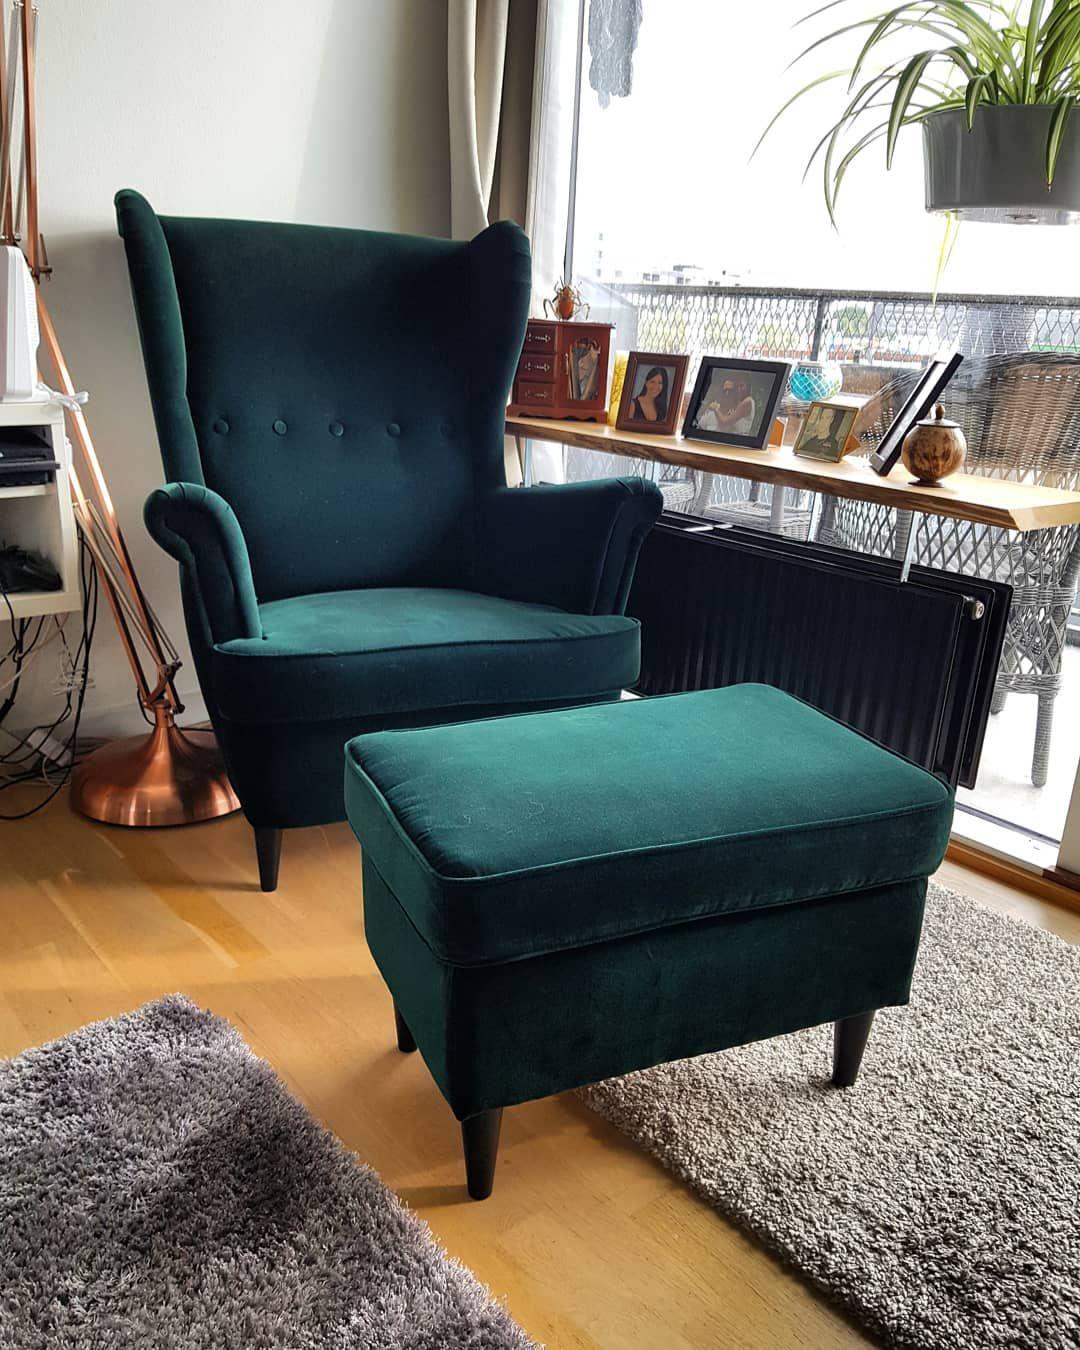 "Vicky Nielsen on Instagram ""ikea strandmon chair"